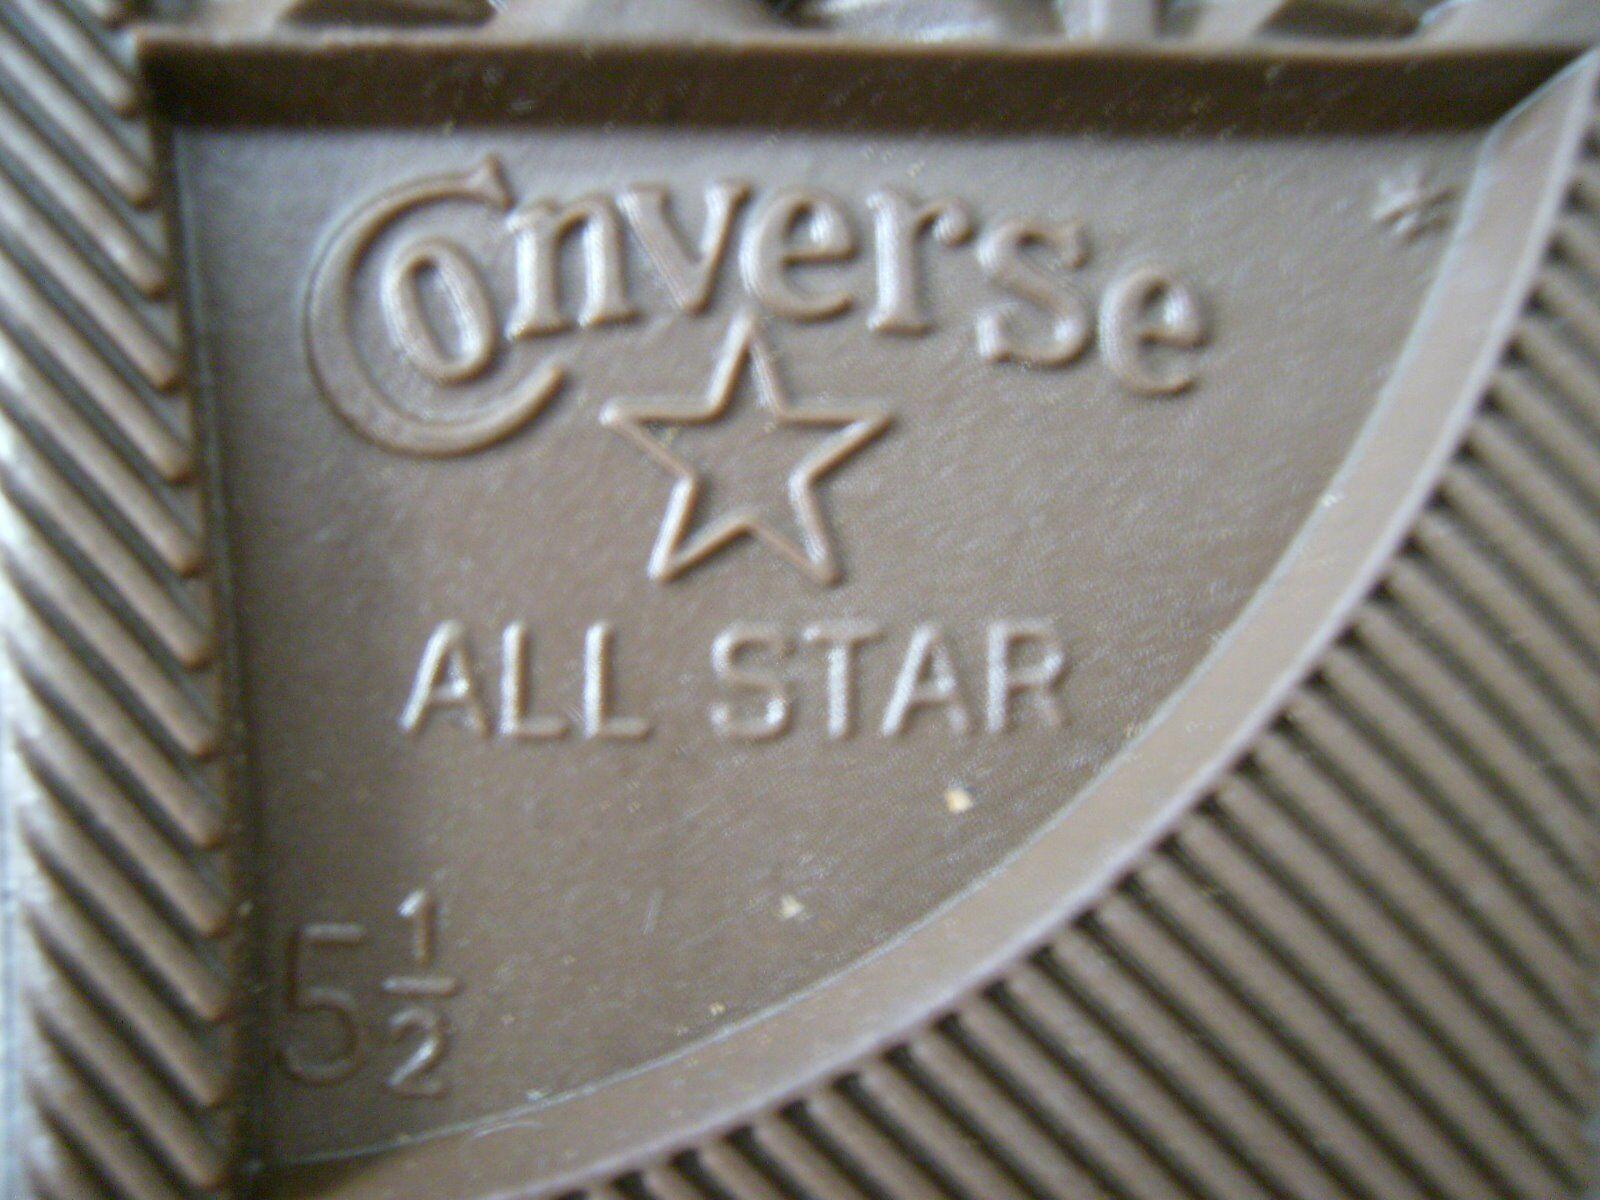 Converse chuck taylor - multi frauen - farbe männern 5,5, frauen multi - 7.5 c0a25d